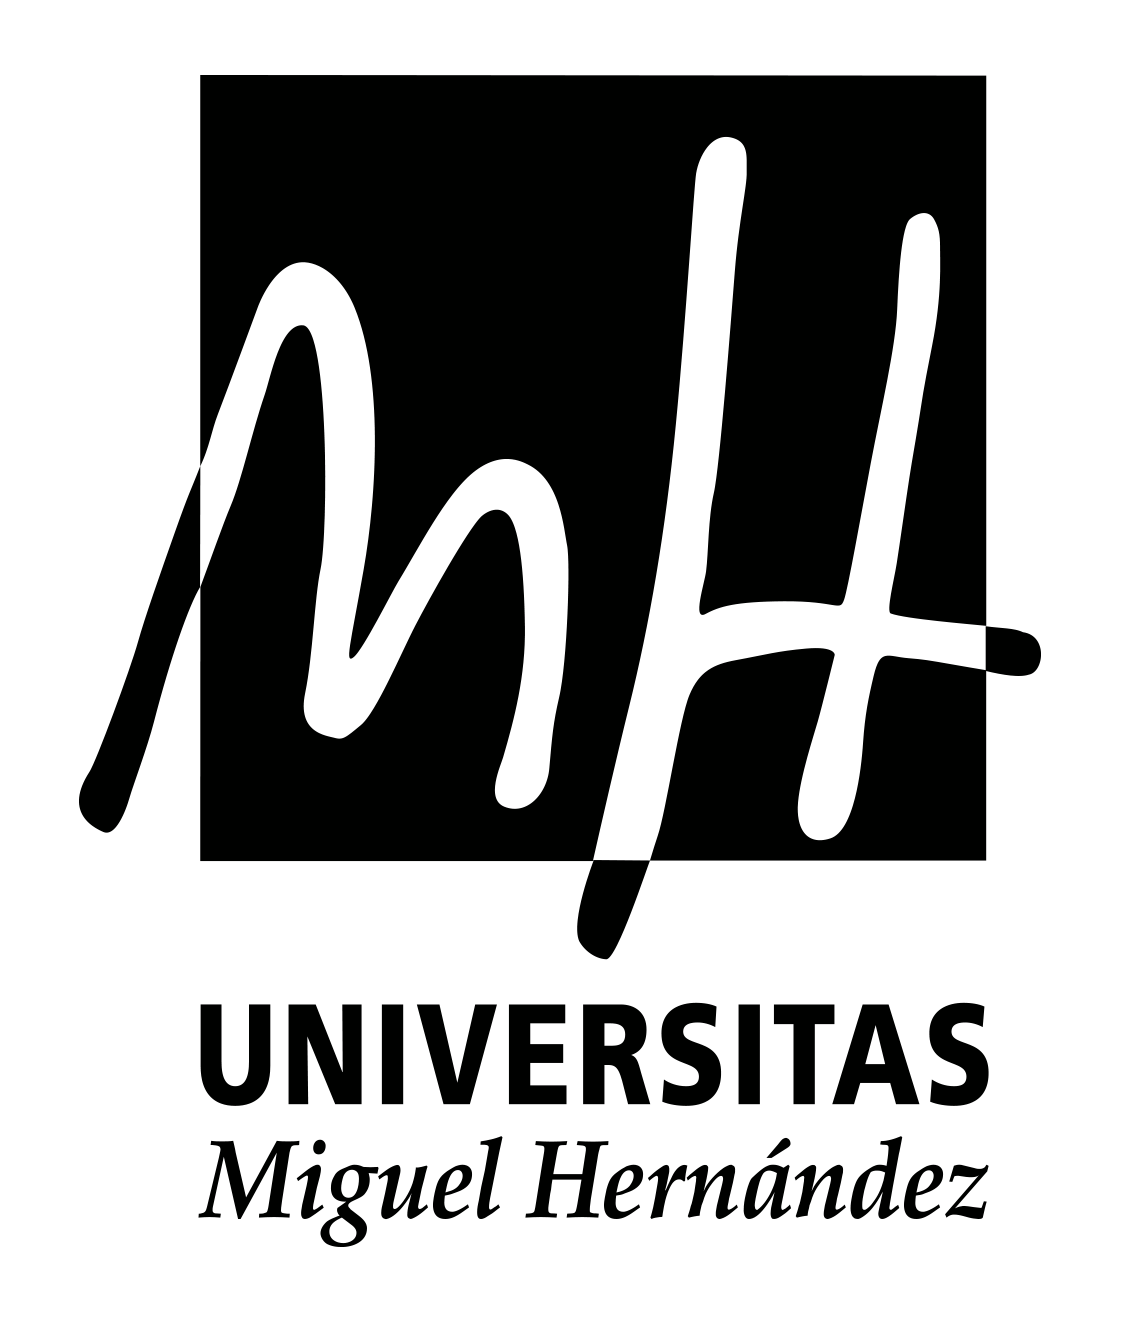 LOGO_20_ANIVERSARIO_UMH_PNG_NEGATIVO_BLANCO